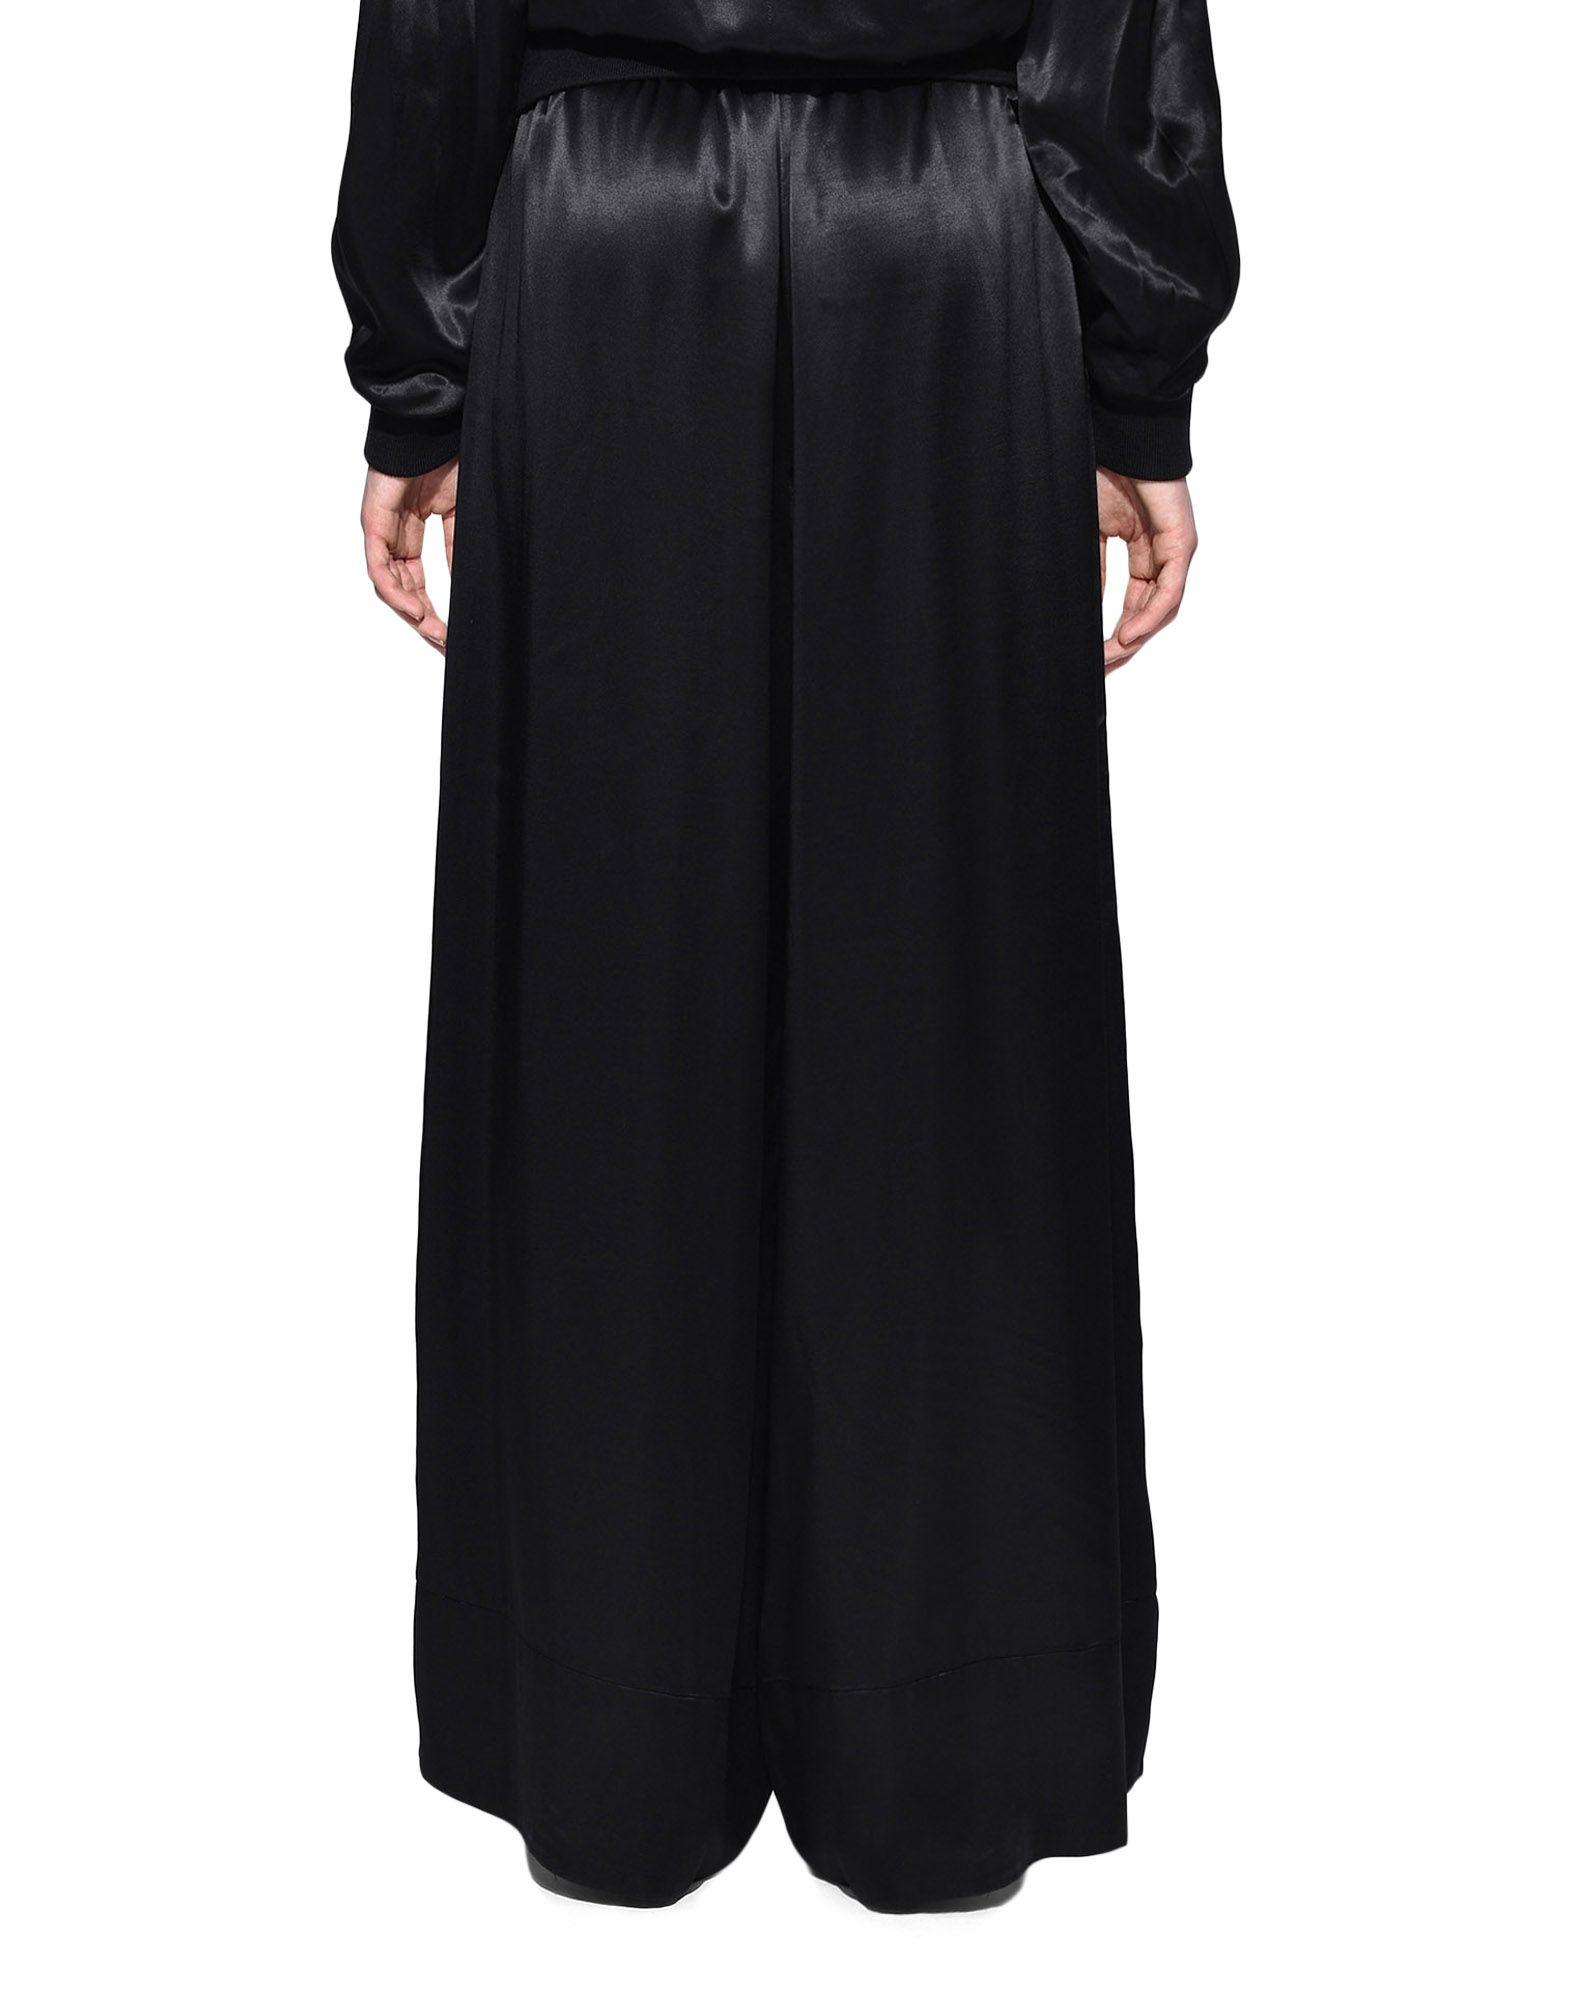 Y-3 Y-3 3-Stripes Lux Wide Track Pants Casual pants Woman d